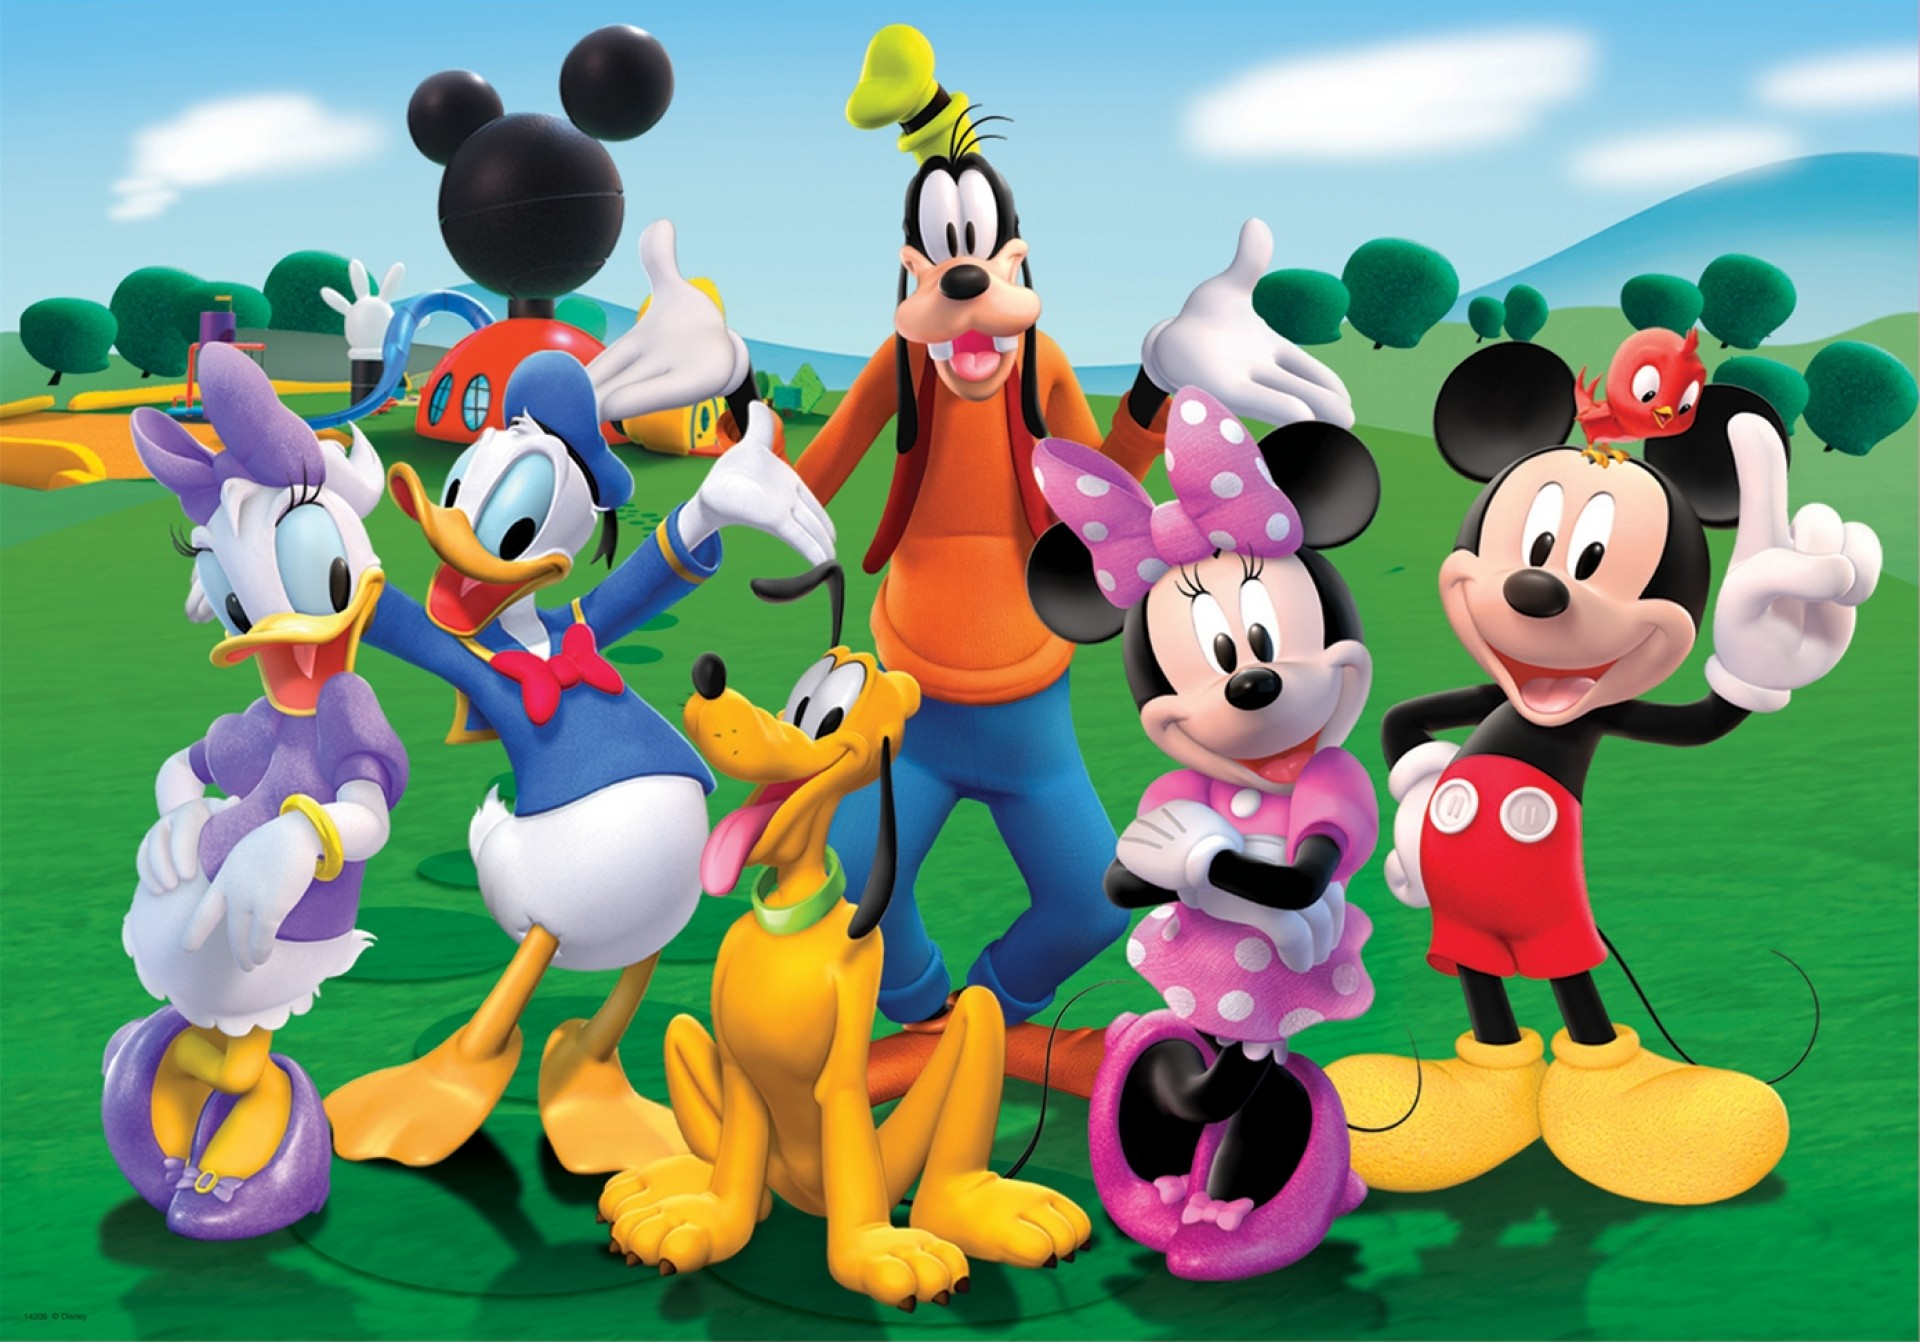 mickey mouse donald duck daisy walt disney free hd wall paper